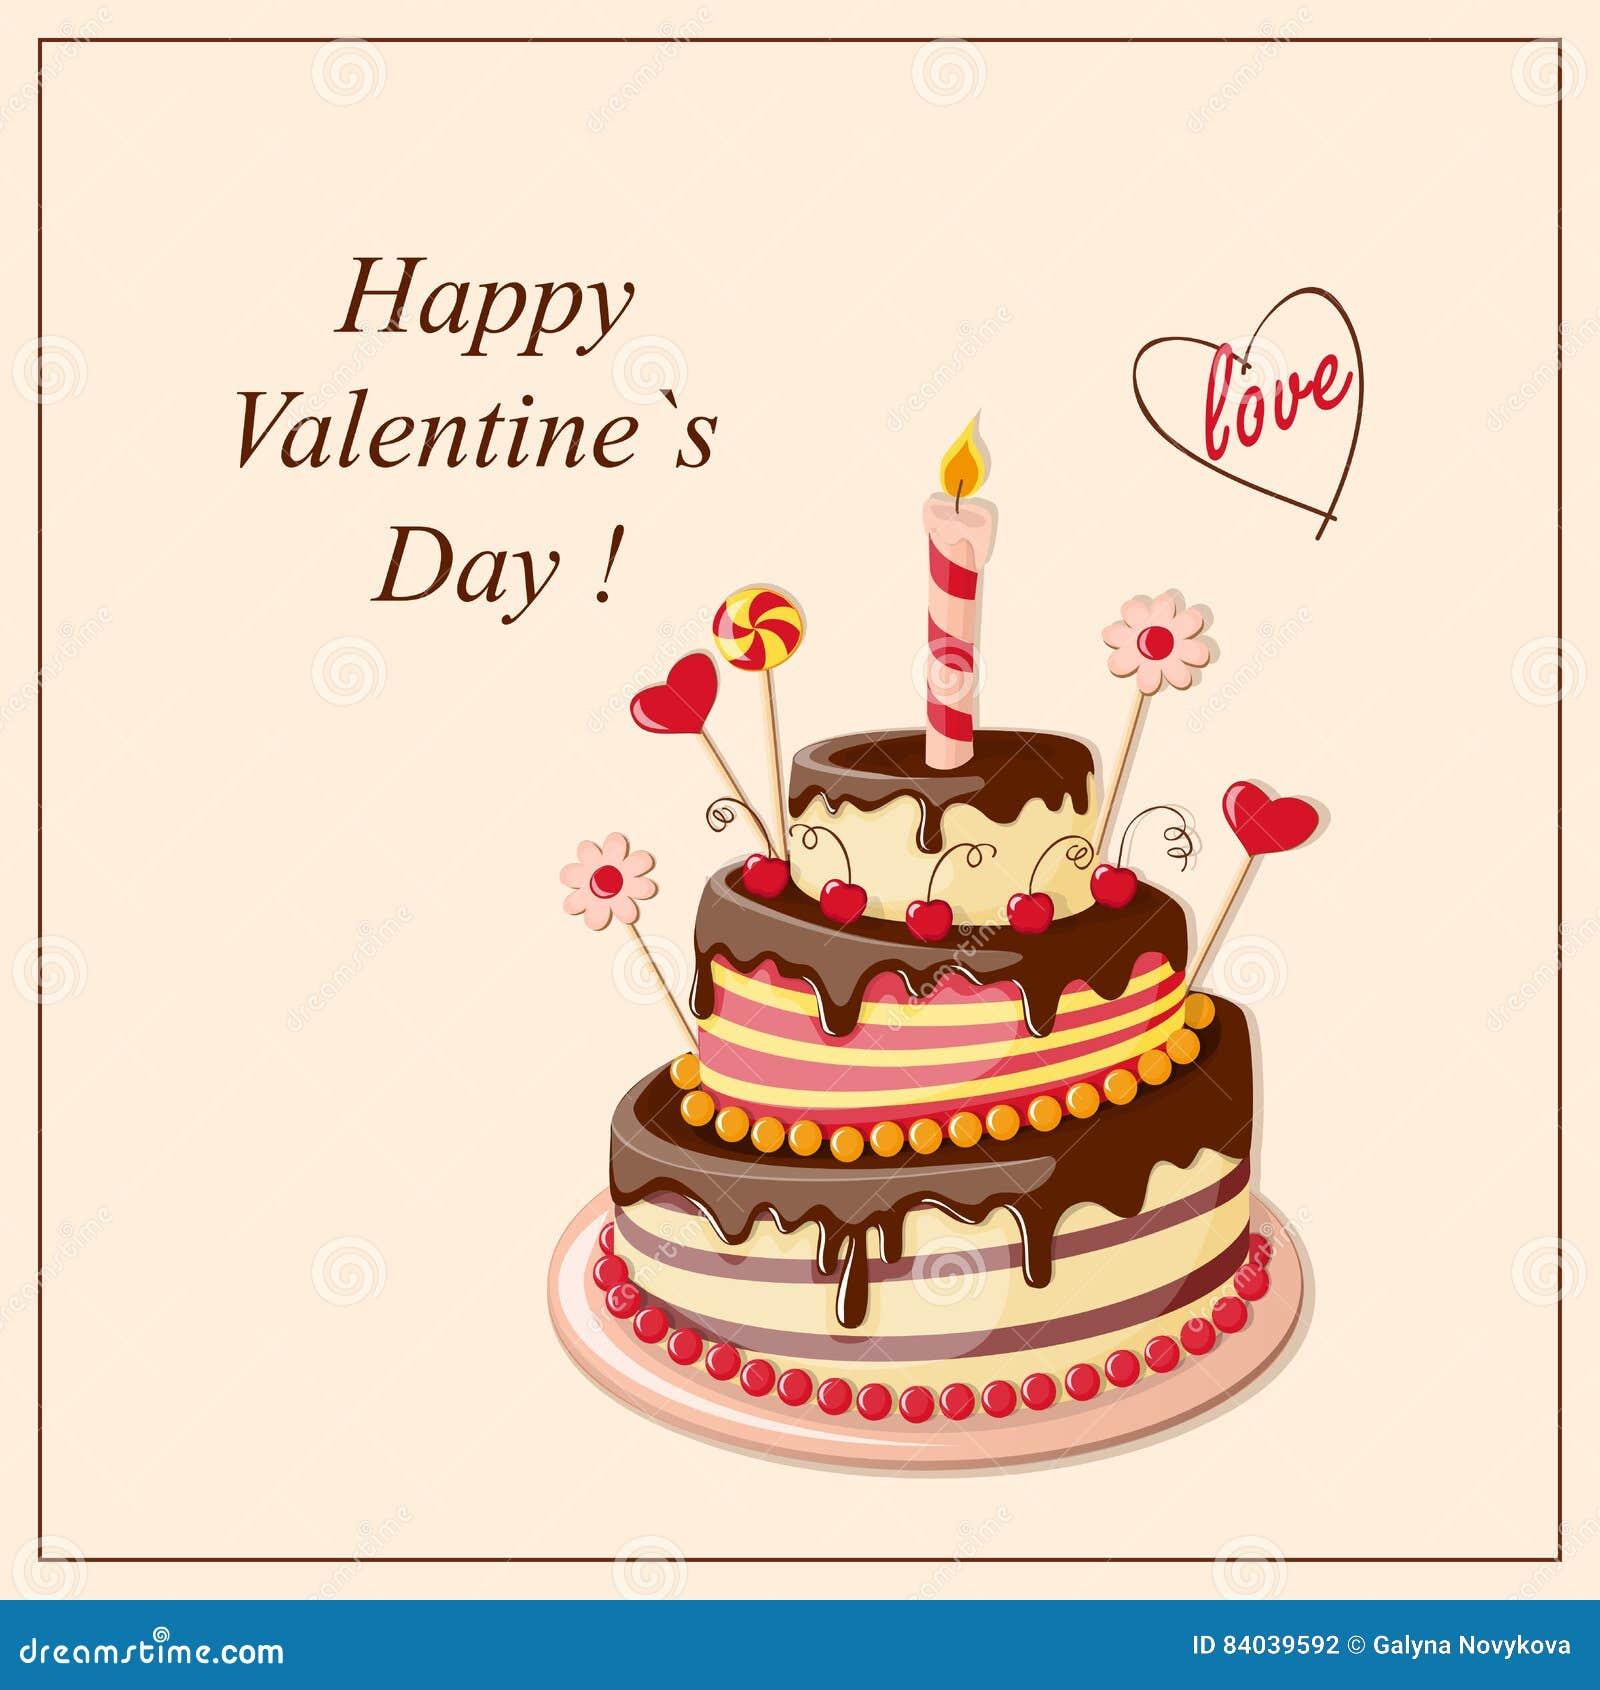 Valentine cake frame stock vector. Illustration of candle - 84039592